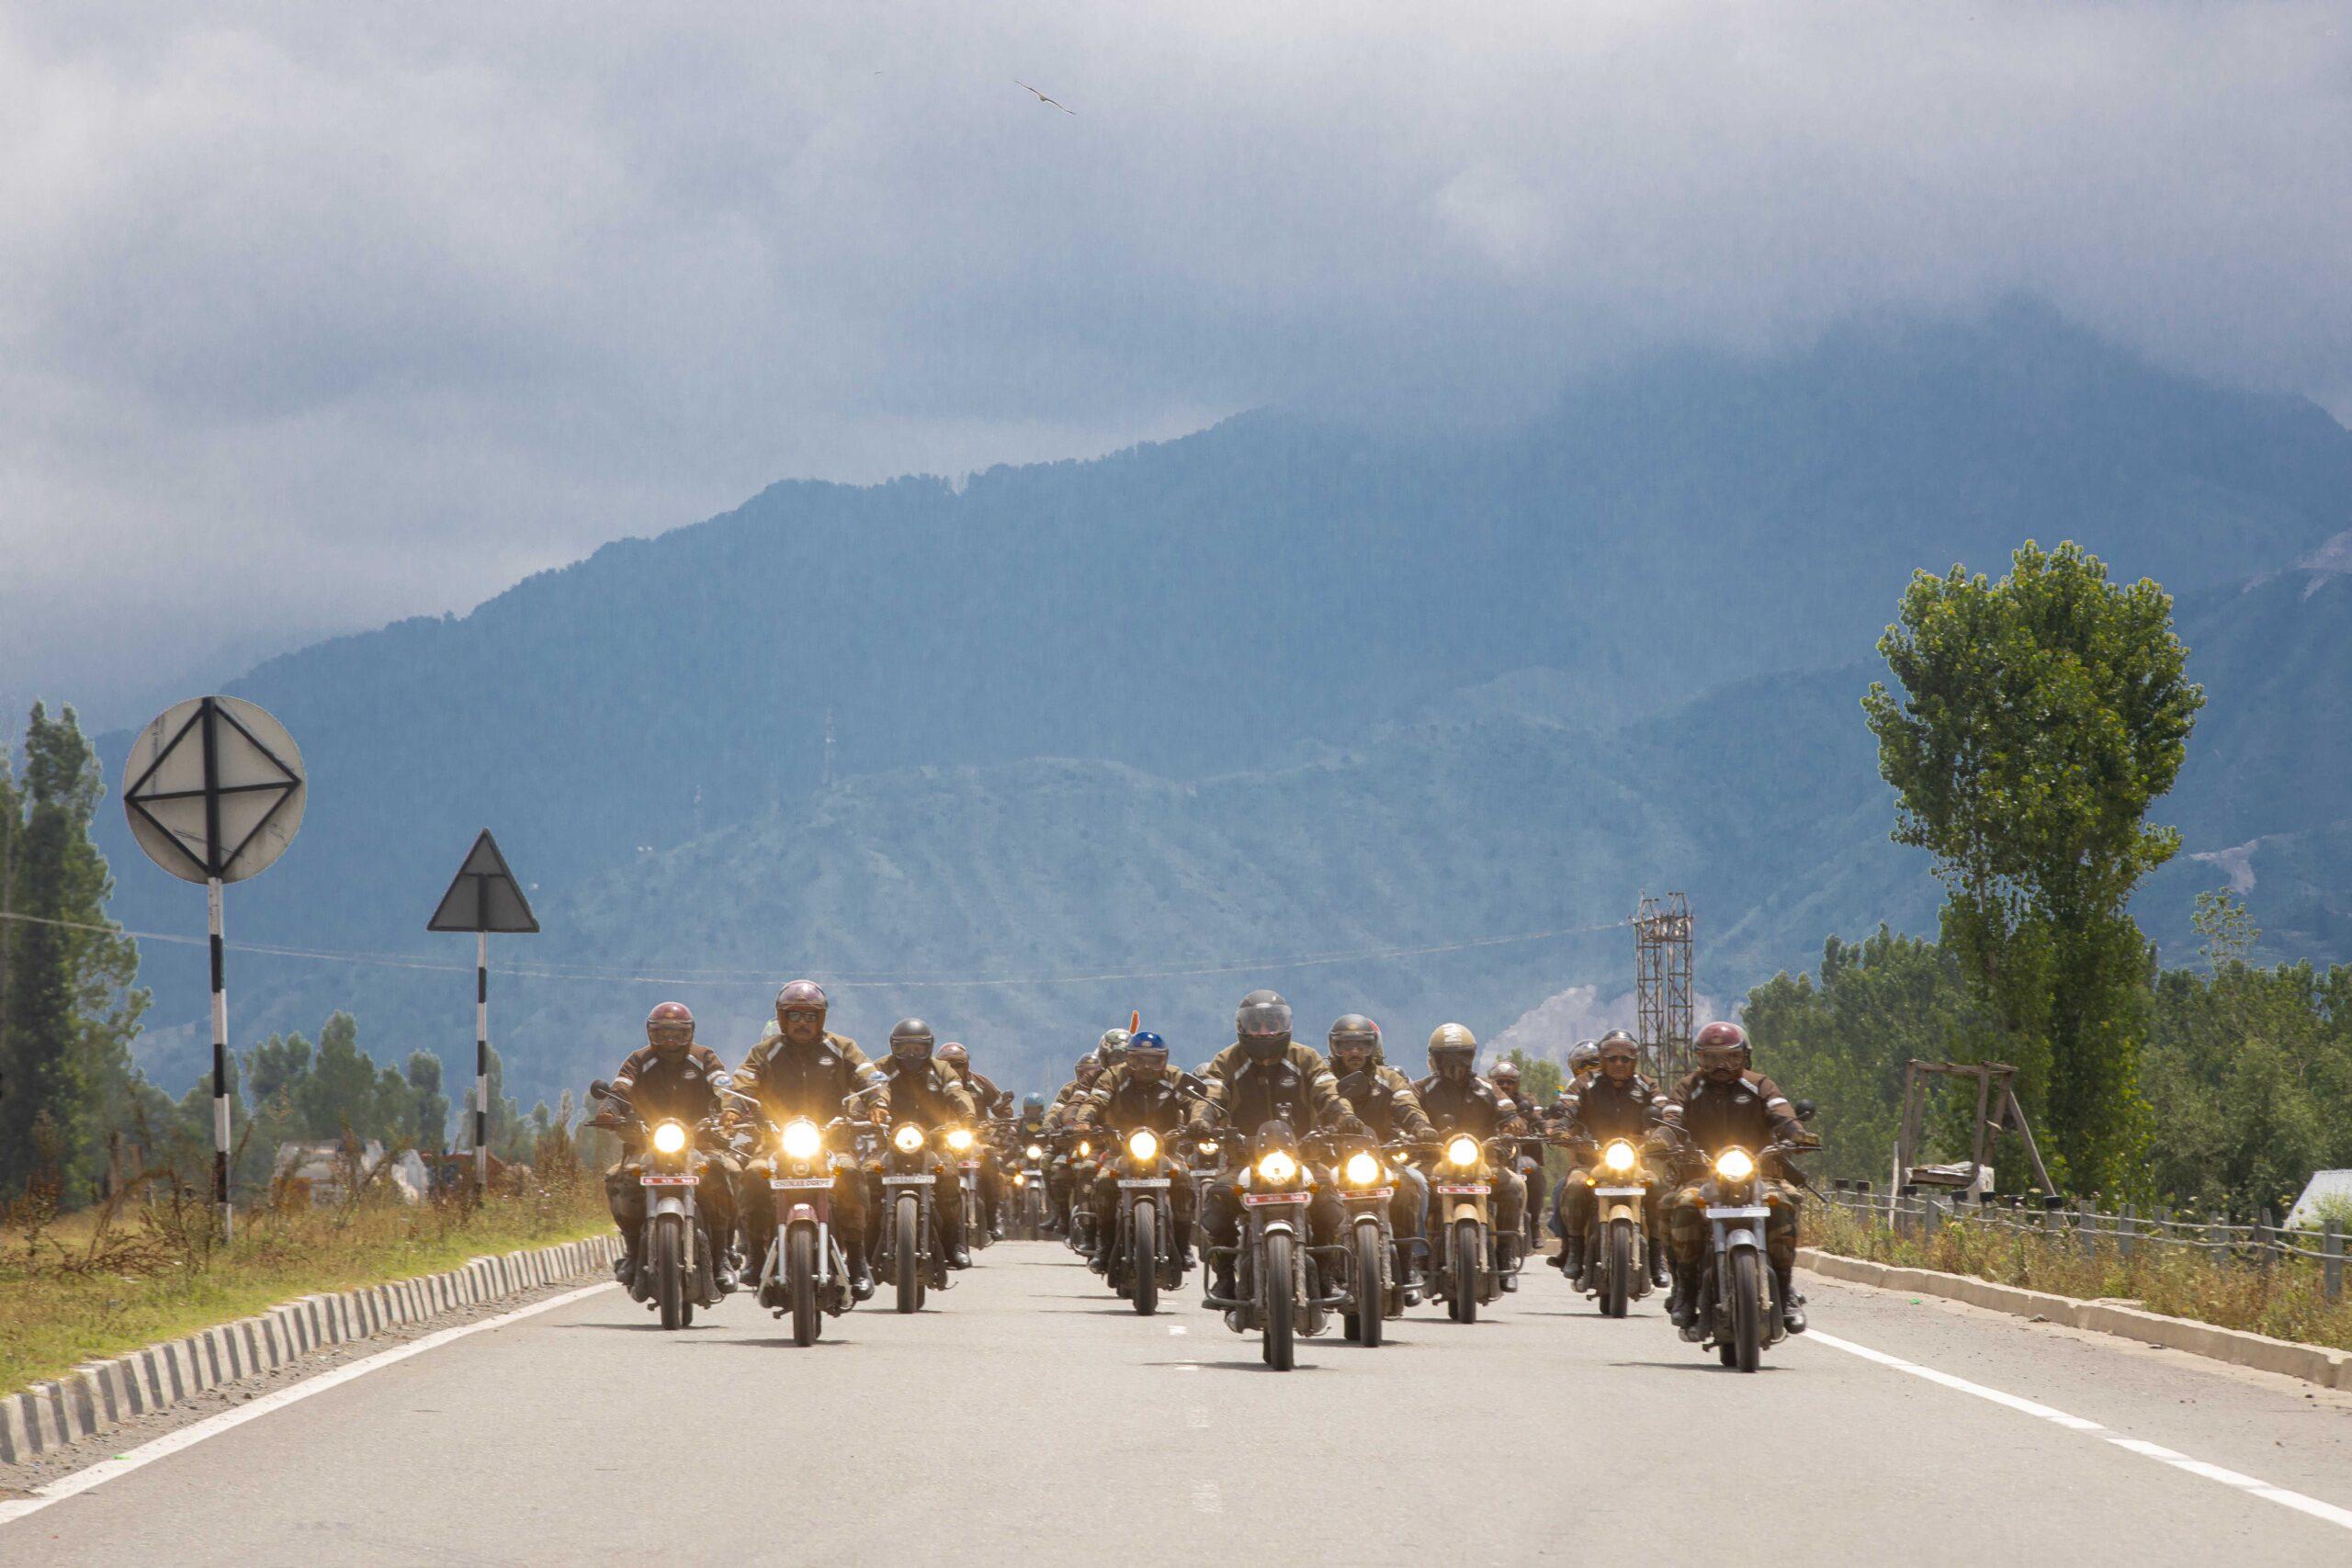 Jawa Motorcycles' Dhruva Kargil Ride in partnership with the Indian Army from Udhampur to Kargil War Memorial, Drass - 4